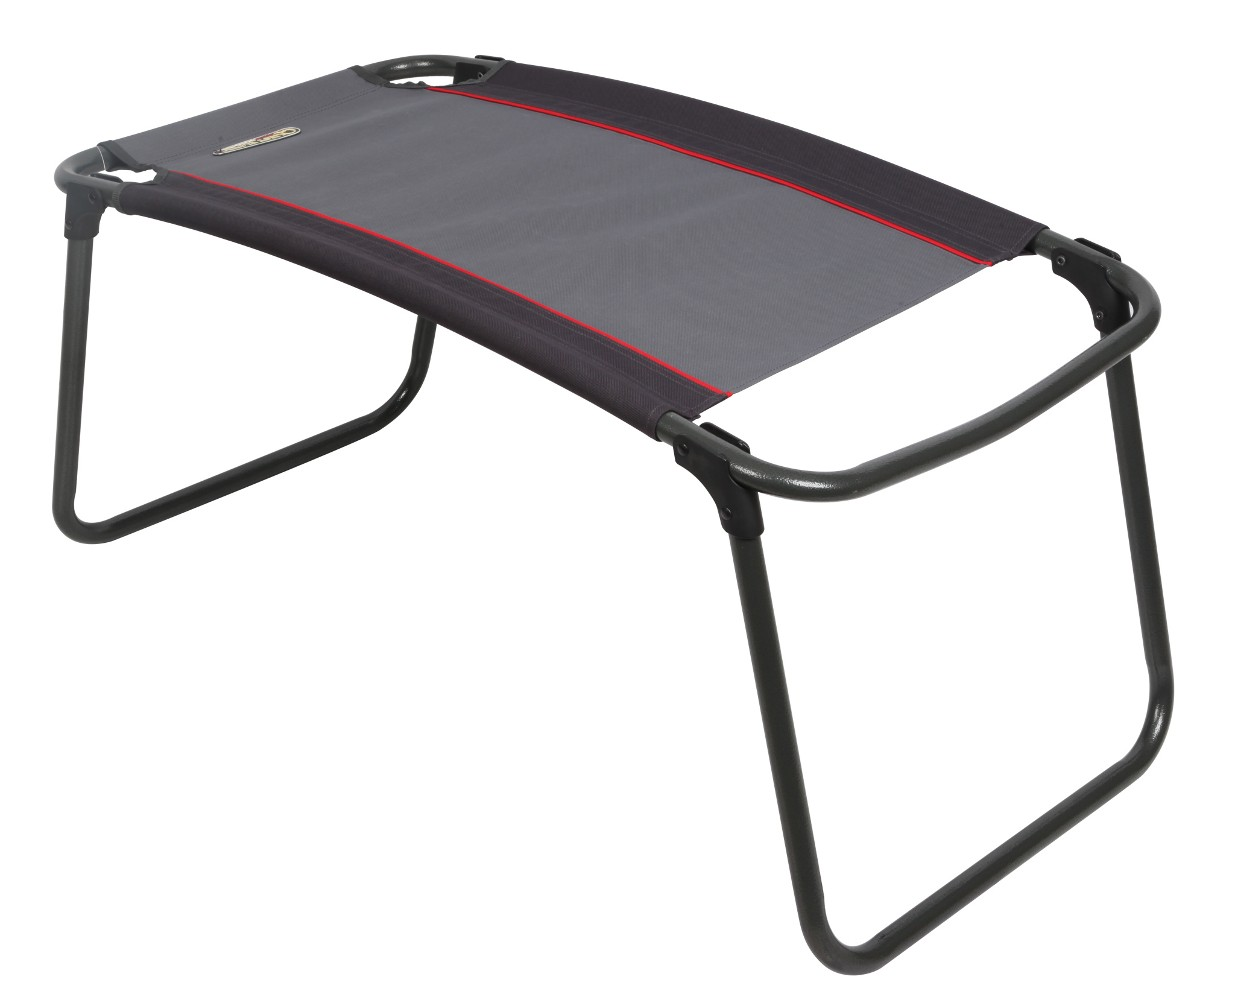 Quest Elite Performance Range Lightweight Folding Footrest